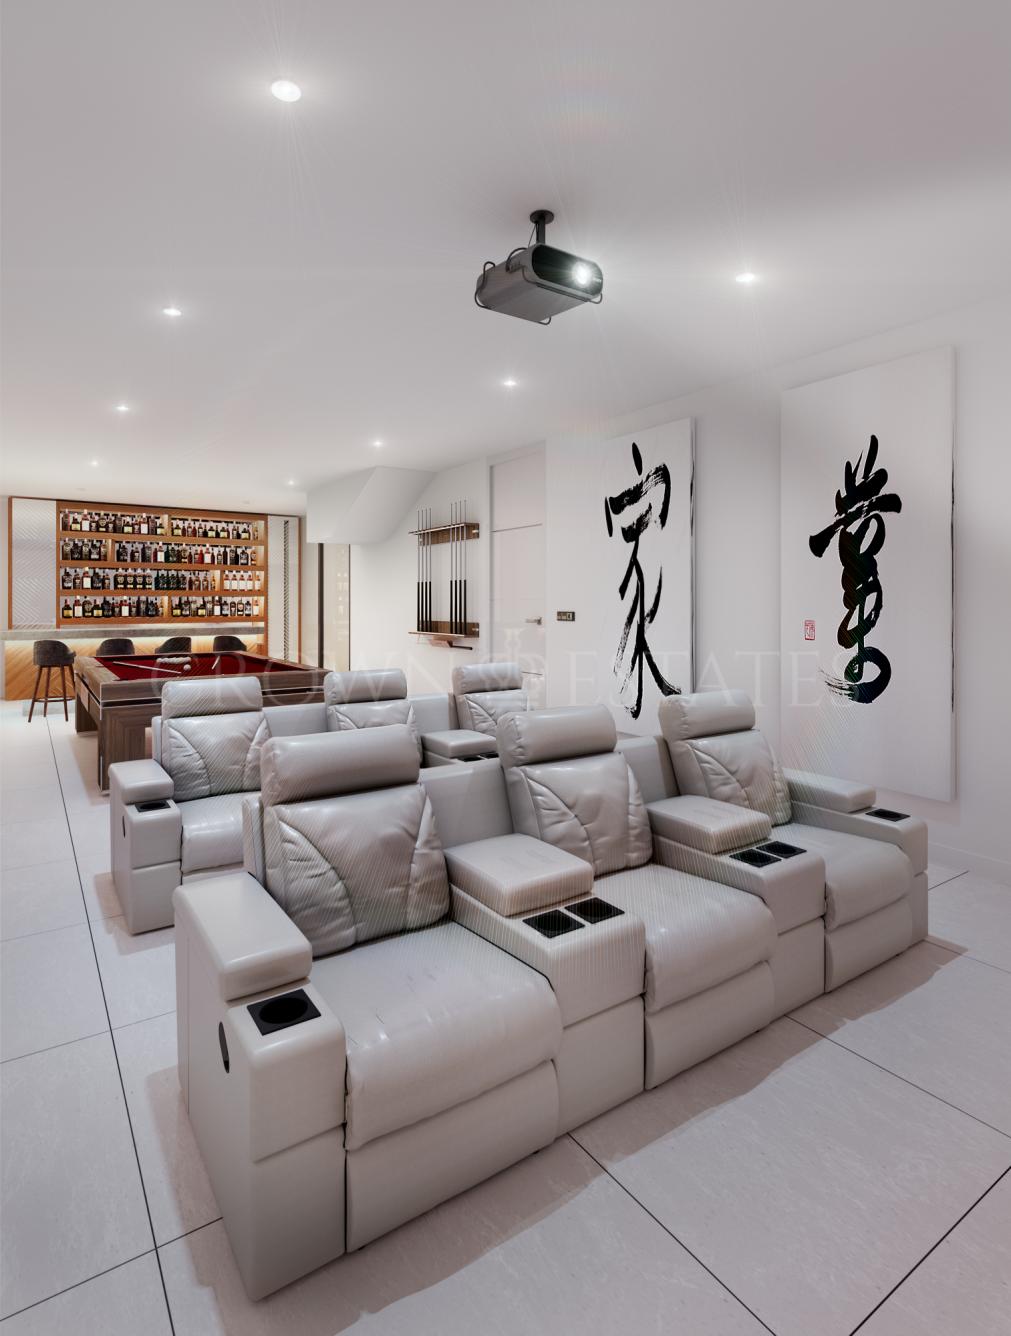 Luxury modern villas located in Rio Verde, Golden Mile in 5 minutes to Puerto Banus